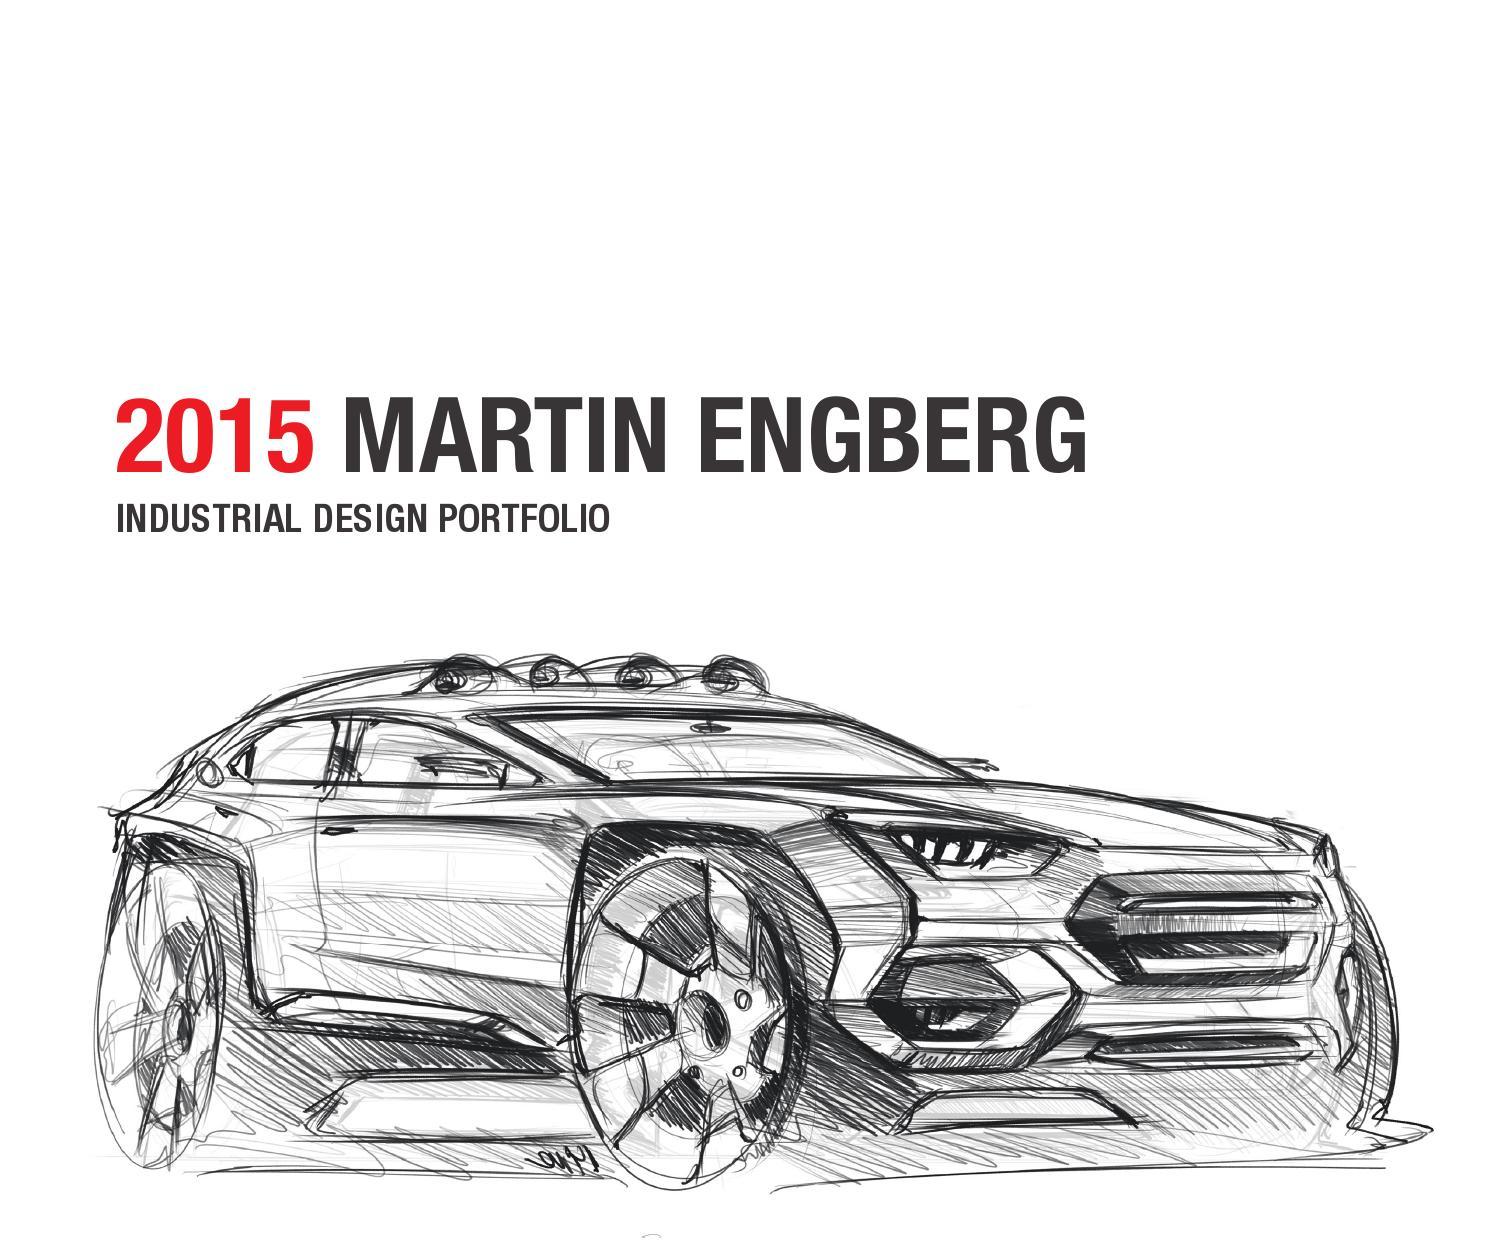 Martins industrial design portfolio 2015 by Martin Engberg - issuu